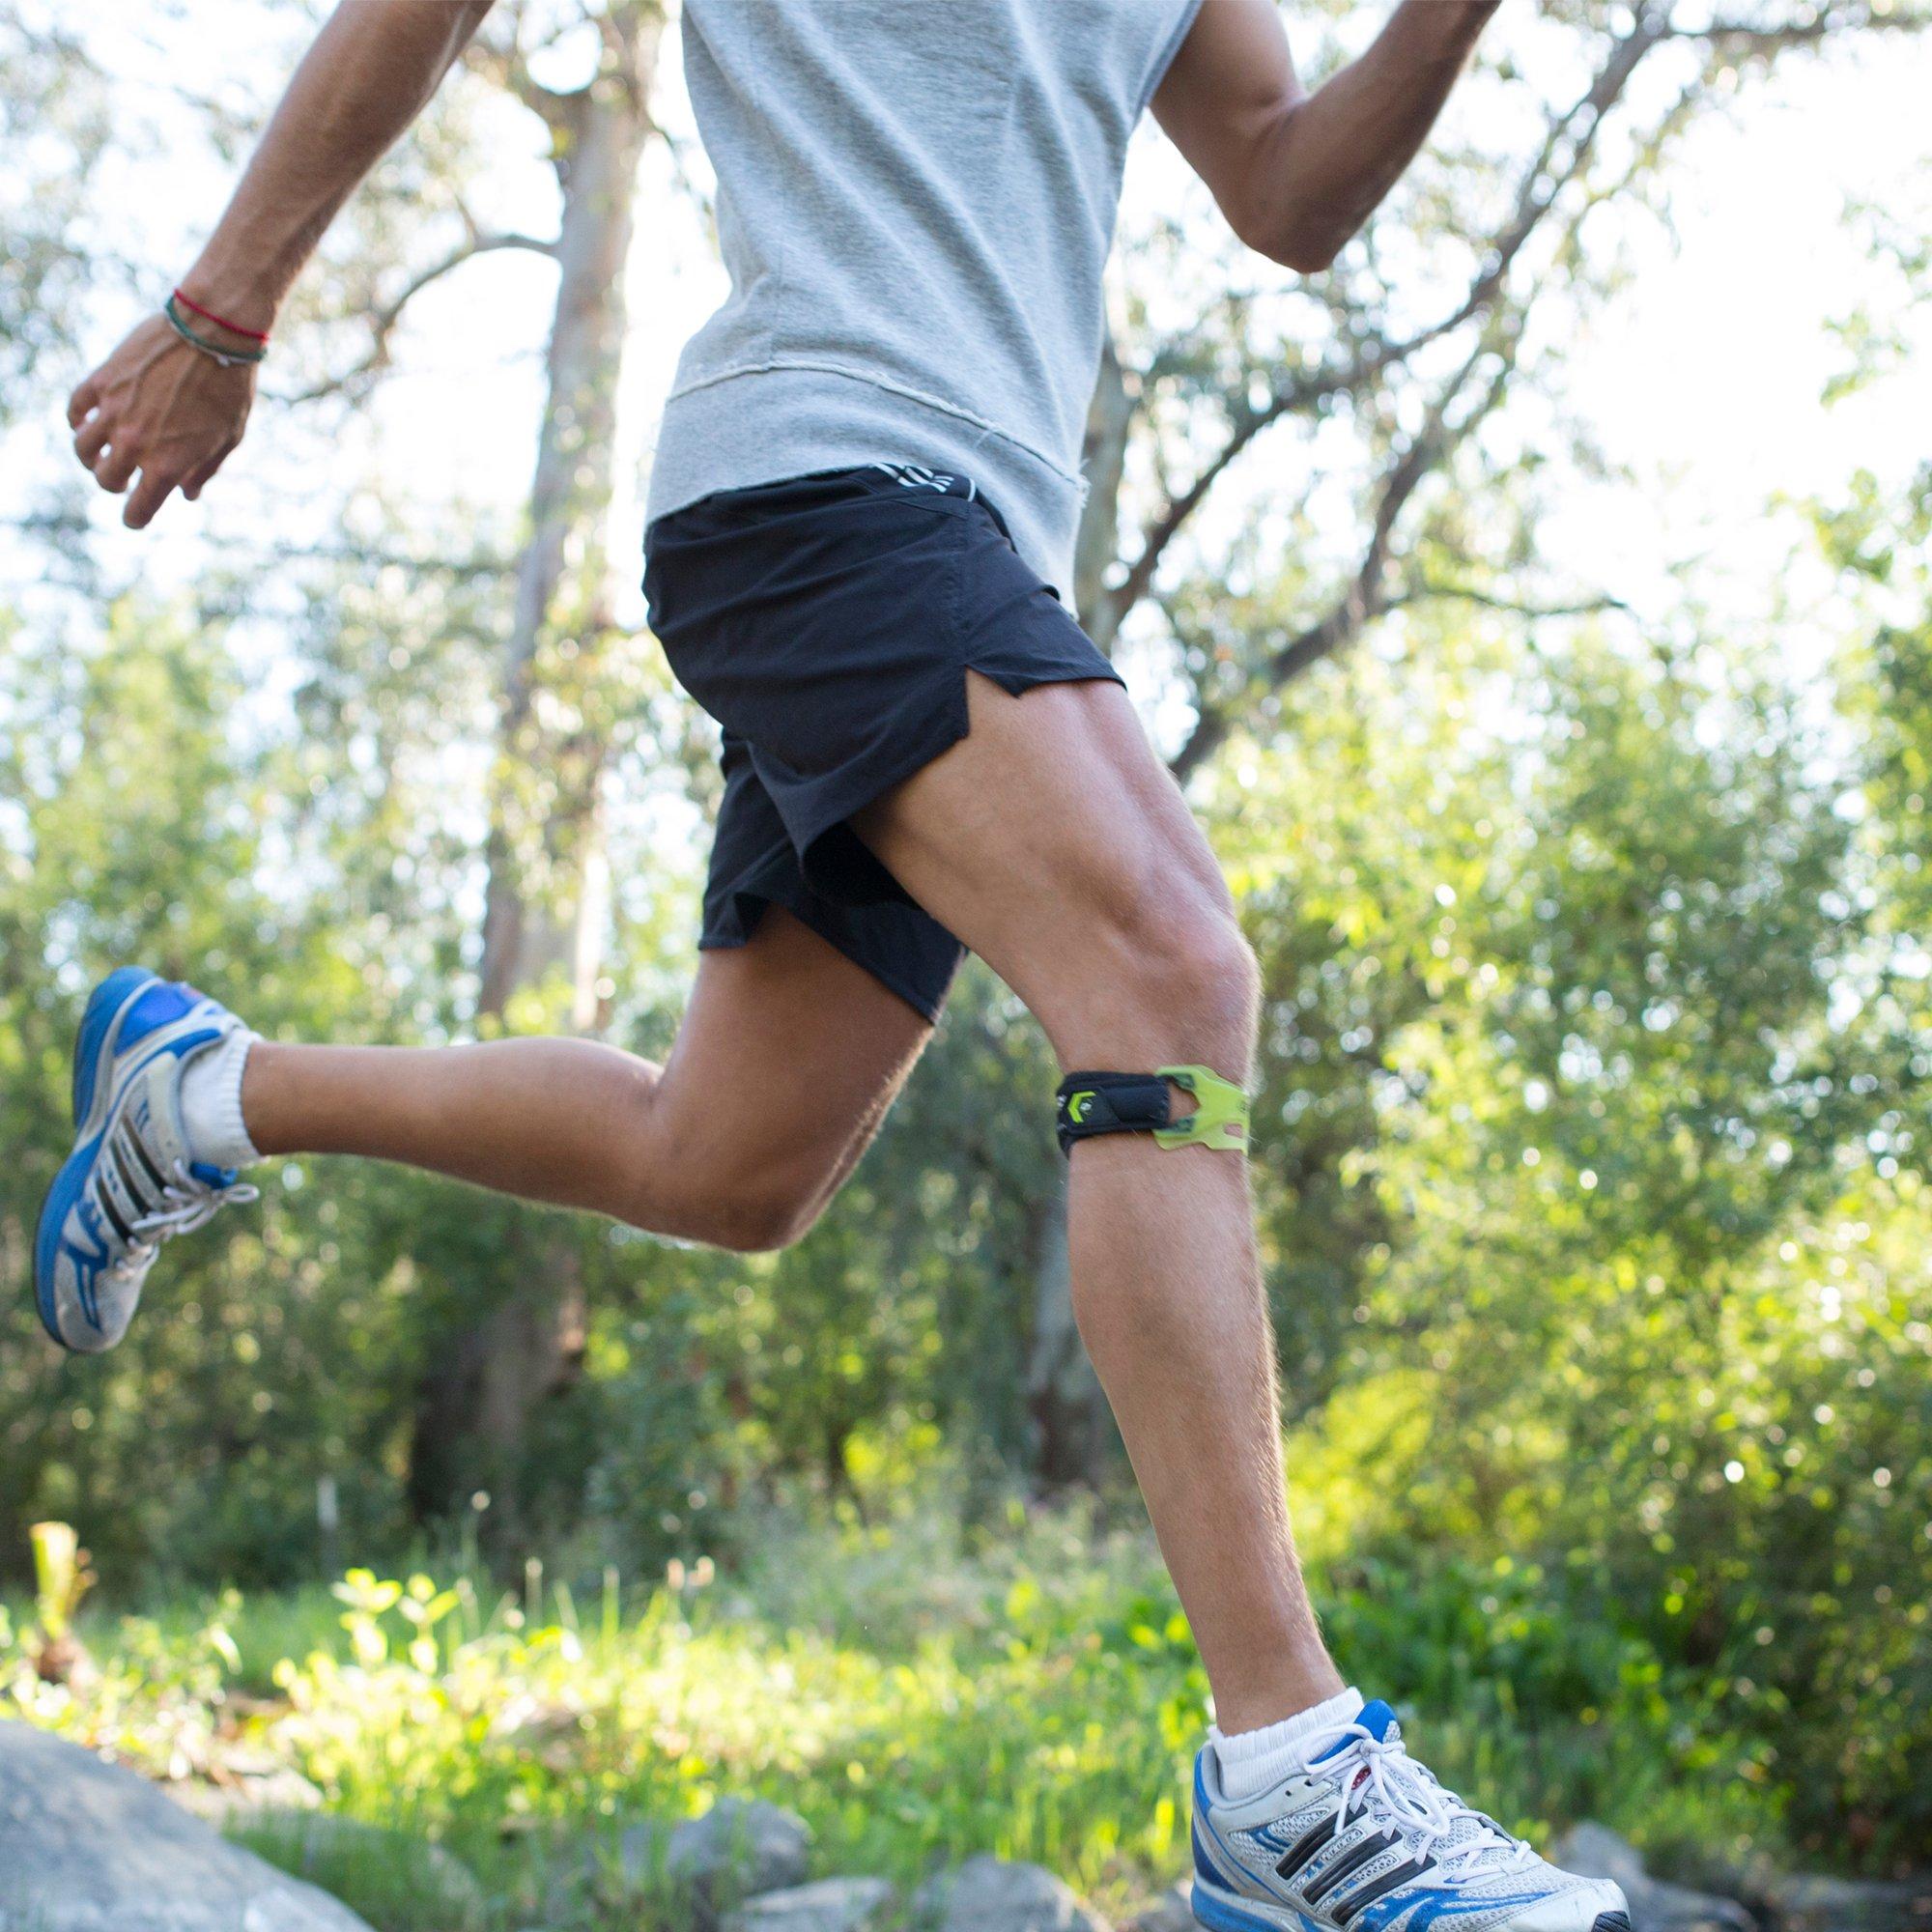 88dc6fad31 DonJoy Performance WEBTECH Knee Support Strap: Black, Small/Medium -  DP151KB03-BLK-S/M < Knee Braces < Health & Household - tibs